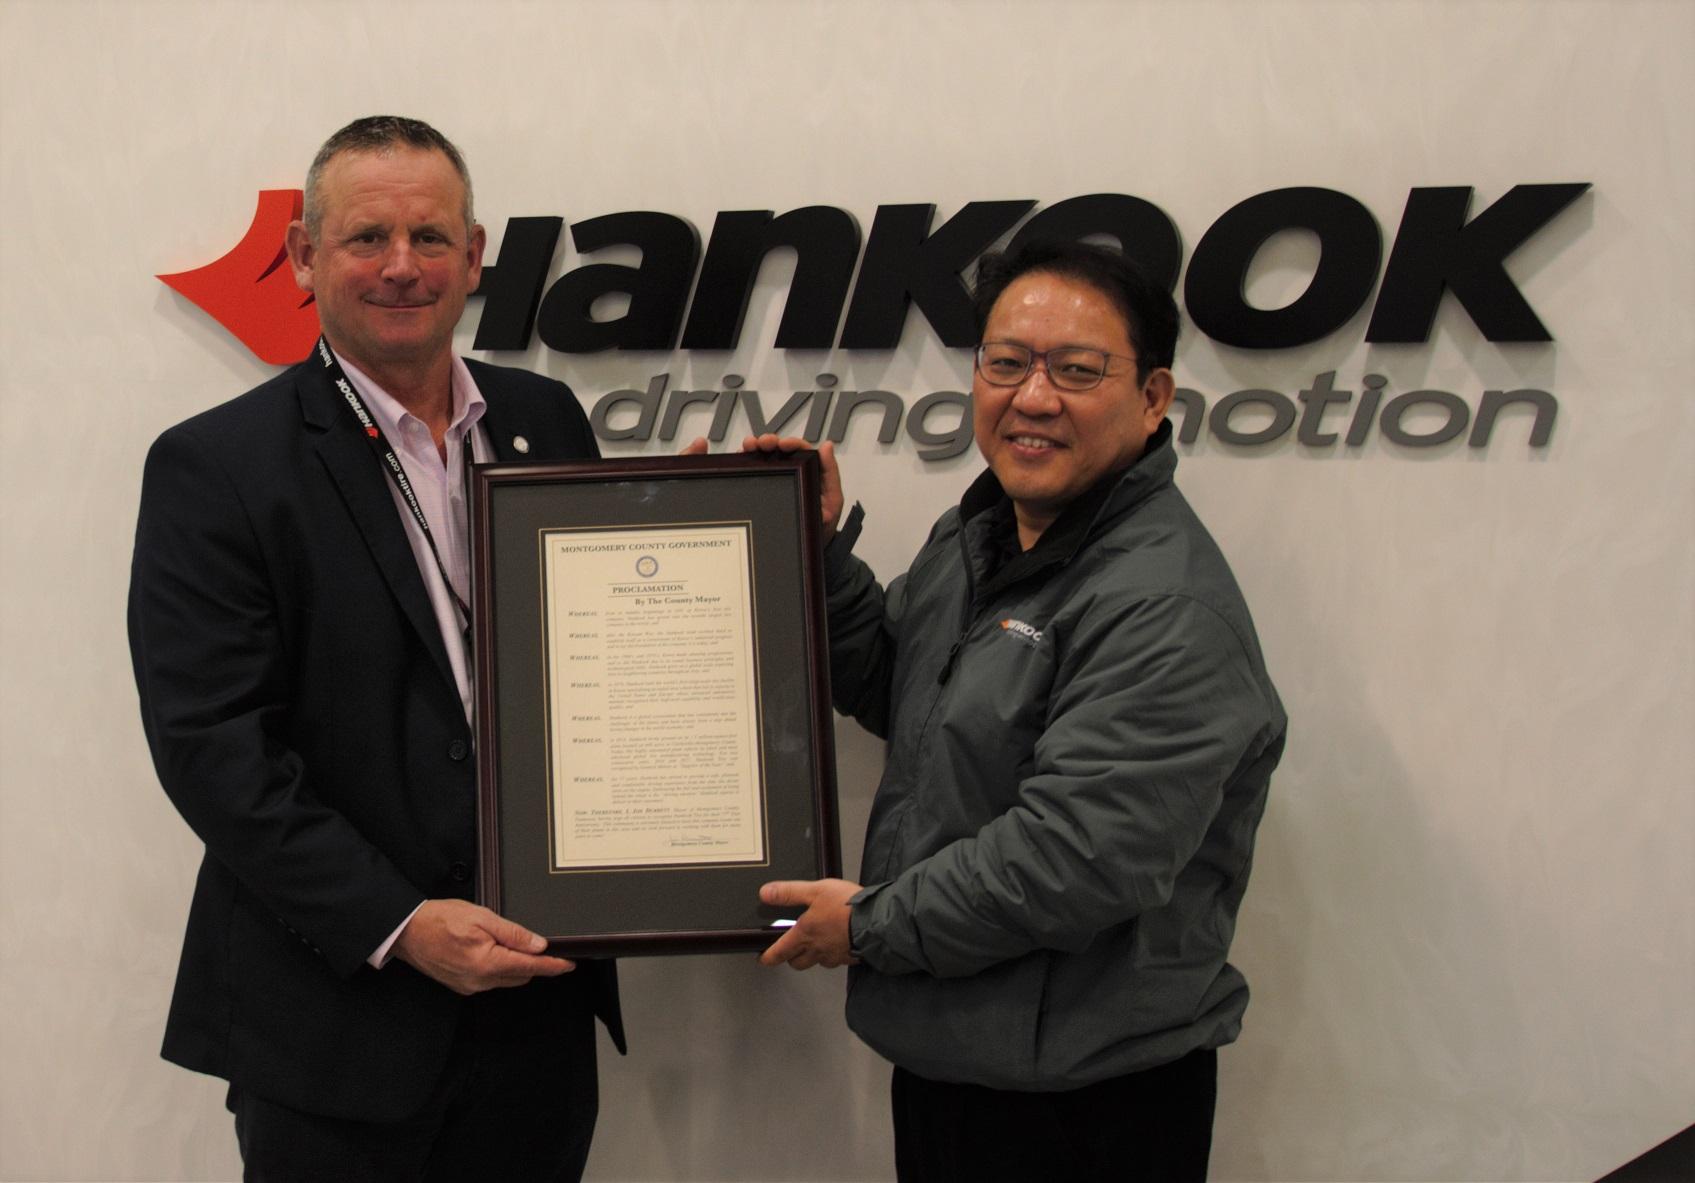 Montgomery County Shows Its Appreciation to Hankook